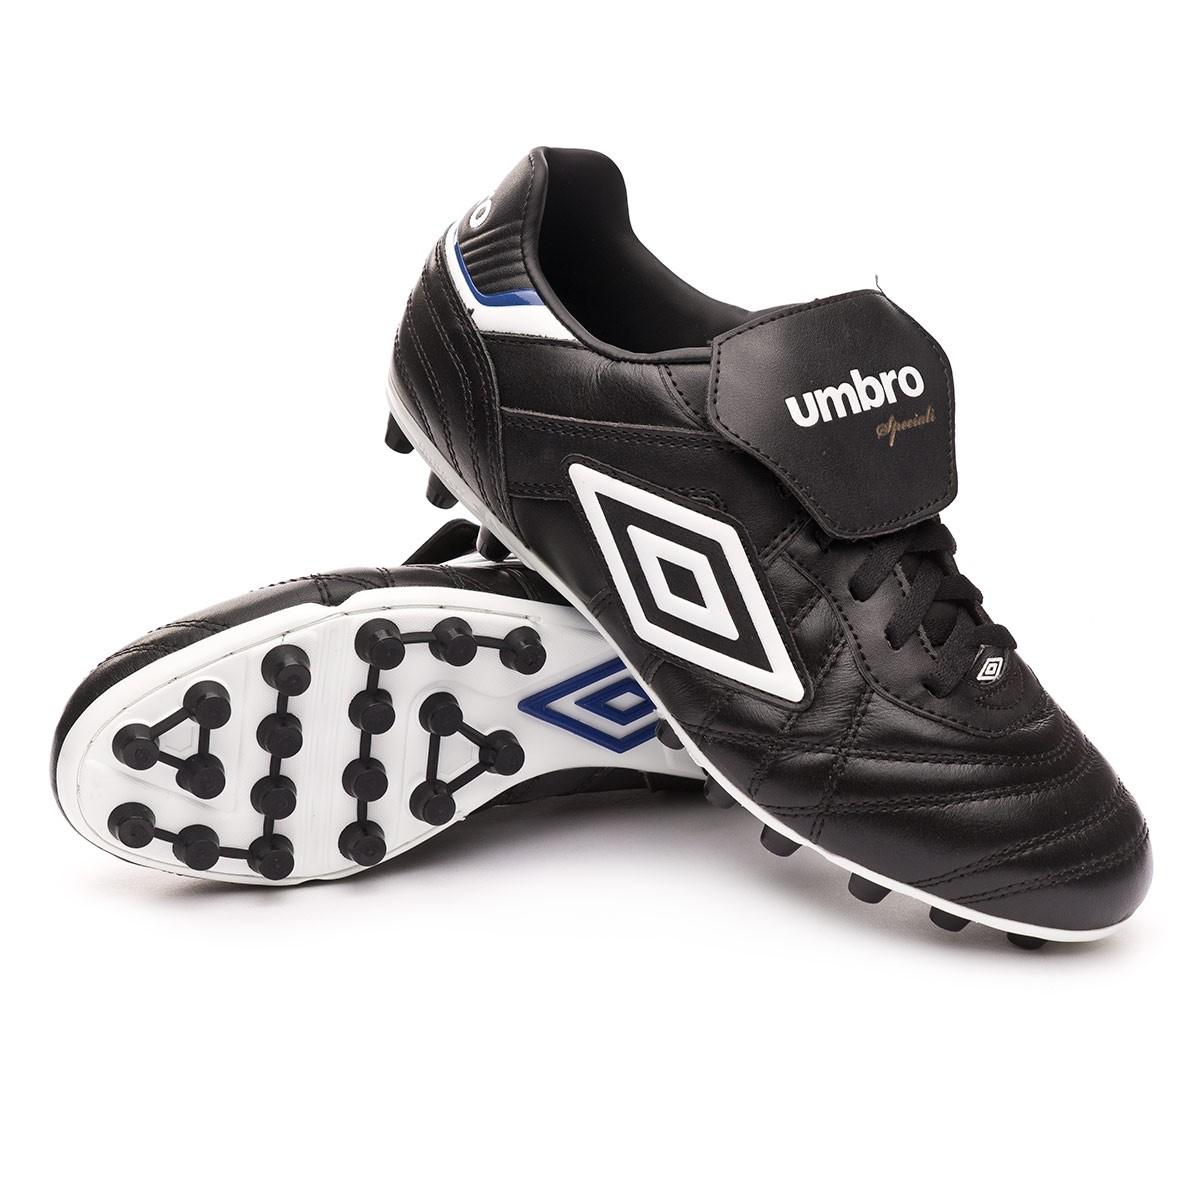 buy online 238cc 951c1 Football Boots Umbro Speciali Eternal Premier AG Black-White - Football  store Fútbol Emotion